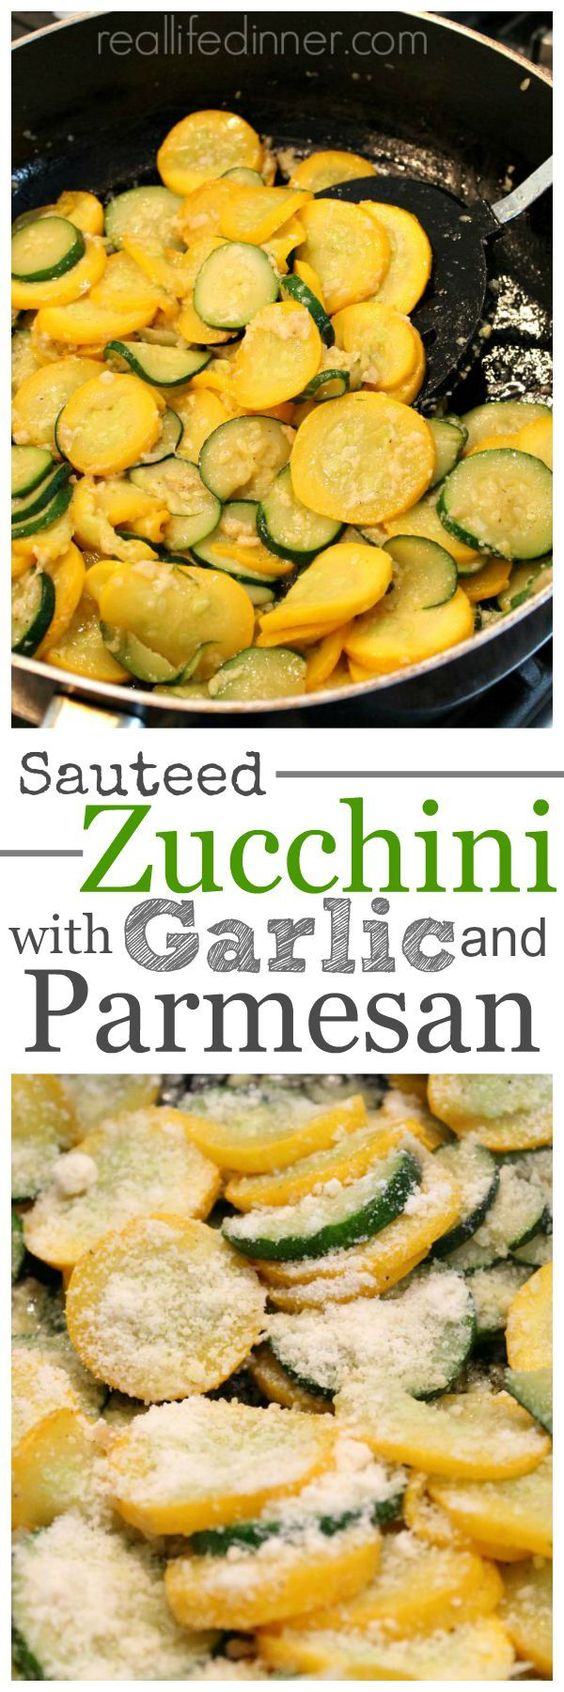 zucchini parmesan quick zucchini and more parmesan sauteed zucchini ...